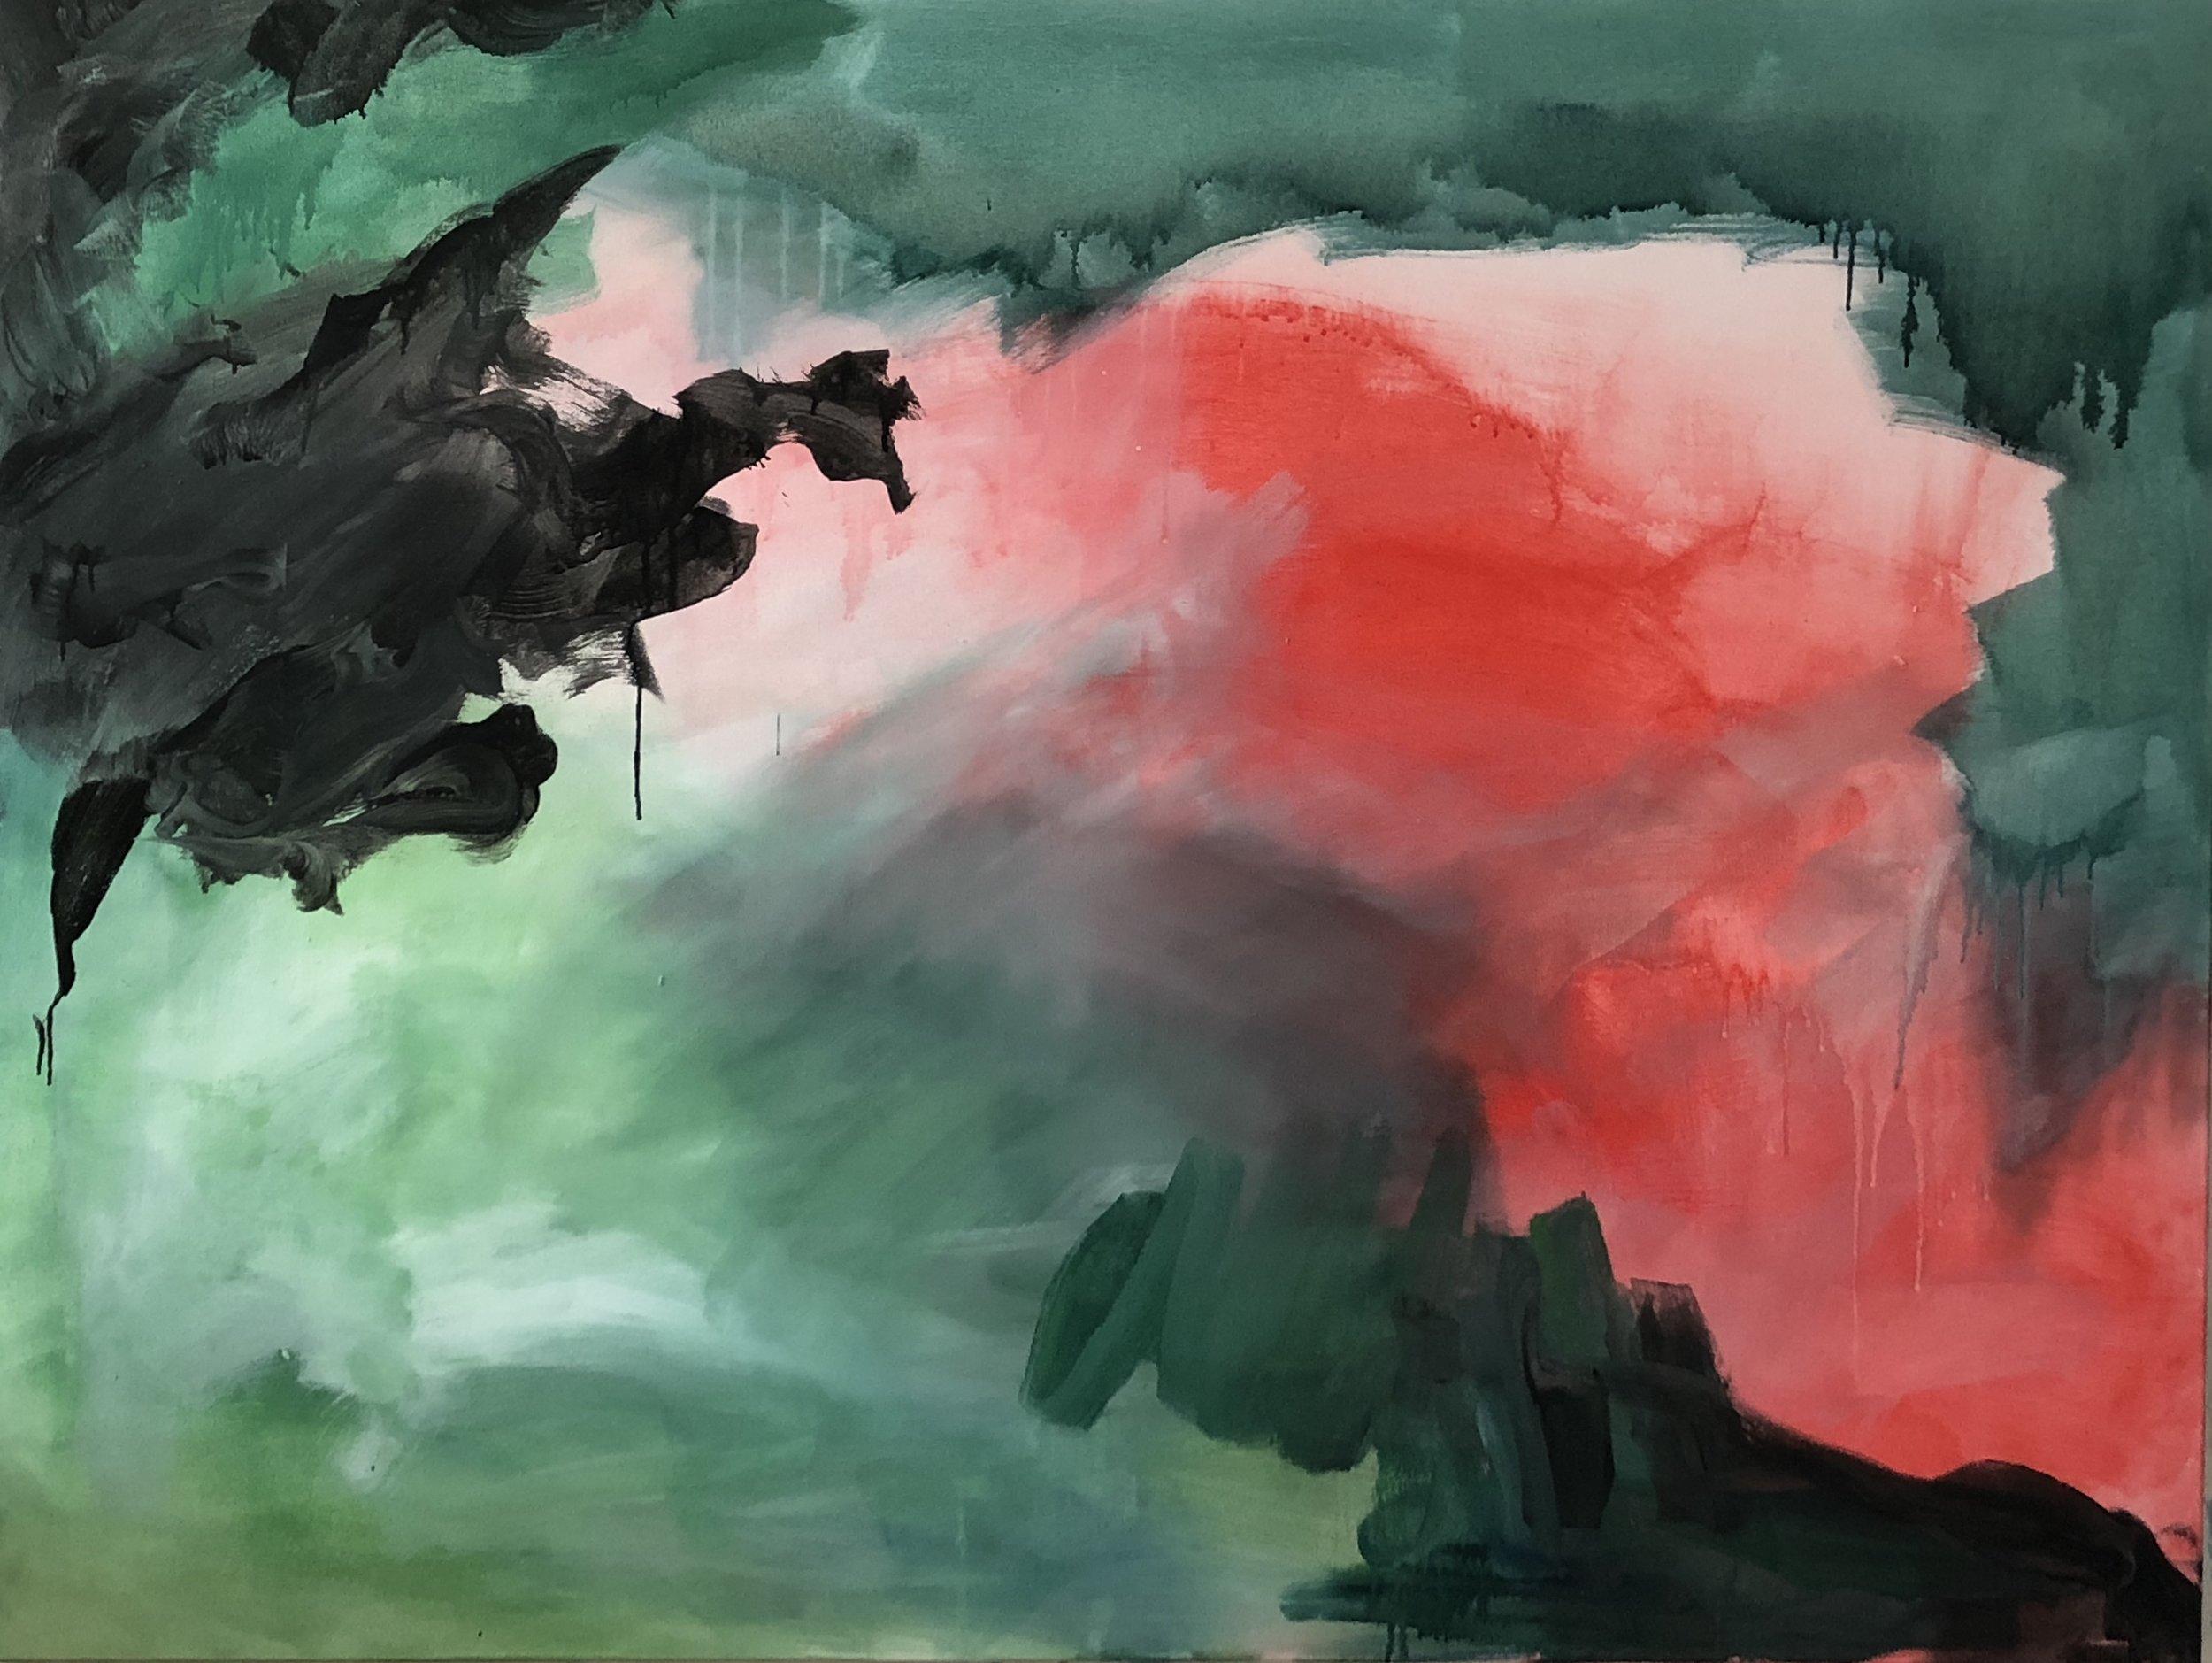 Untitled, 145cm x 100cm, Acrylic on canvas